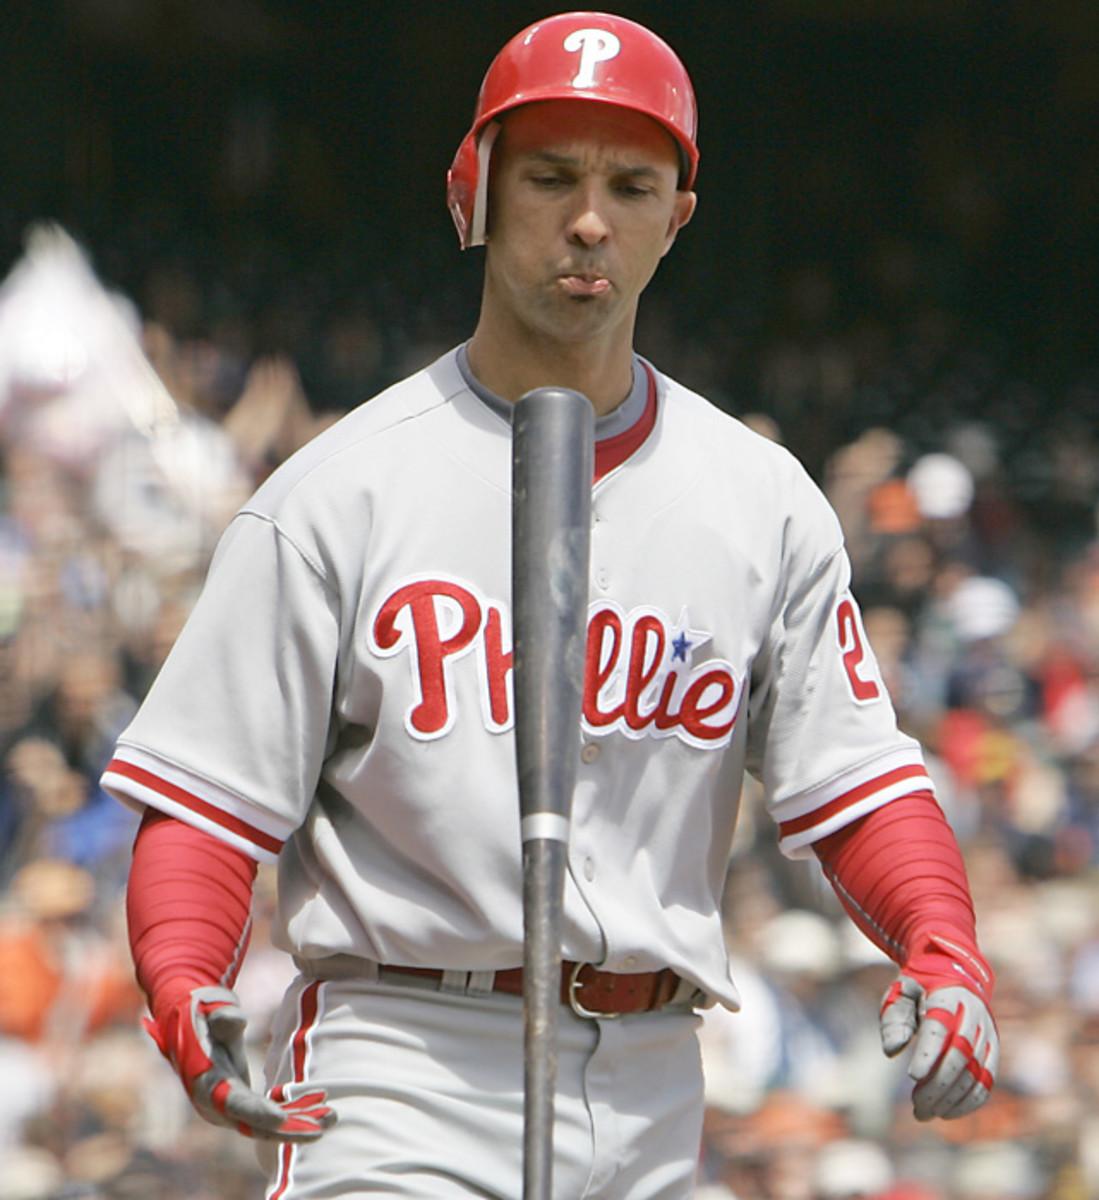 Raul Ibanez, Phillies